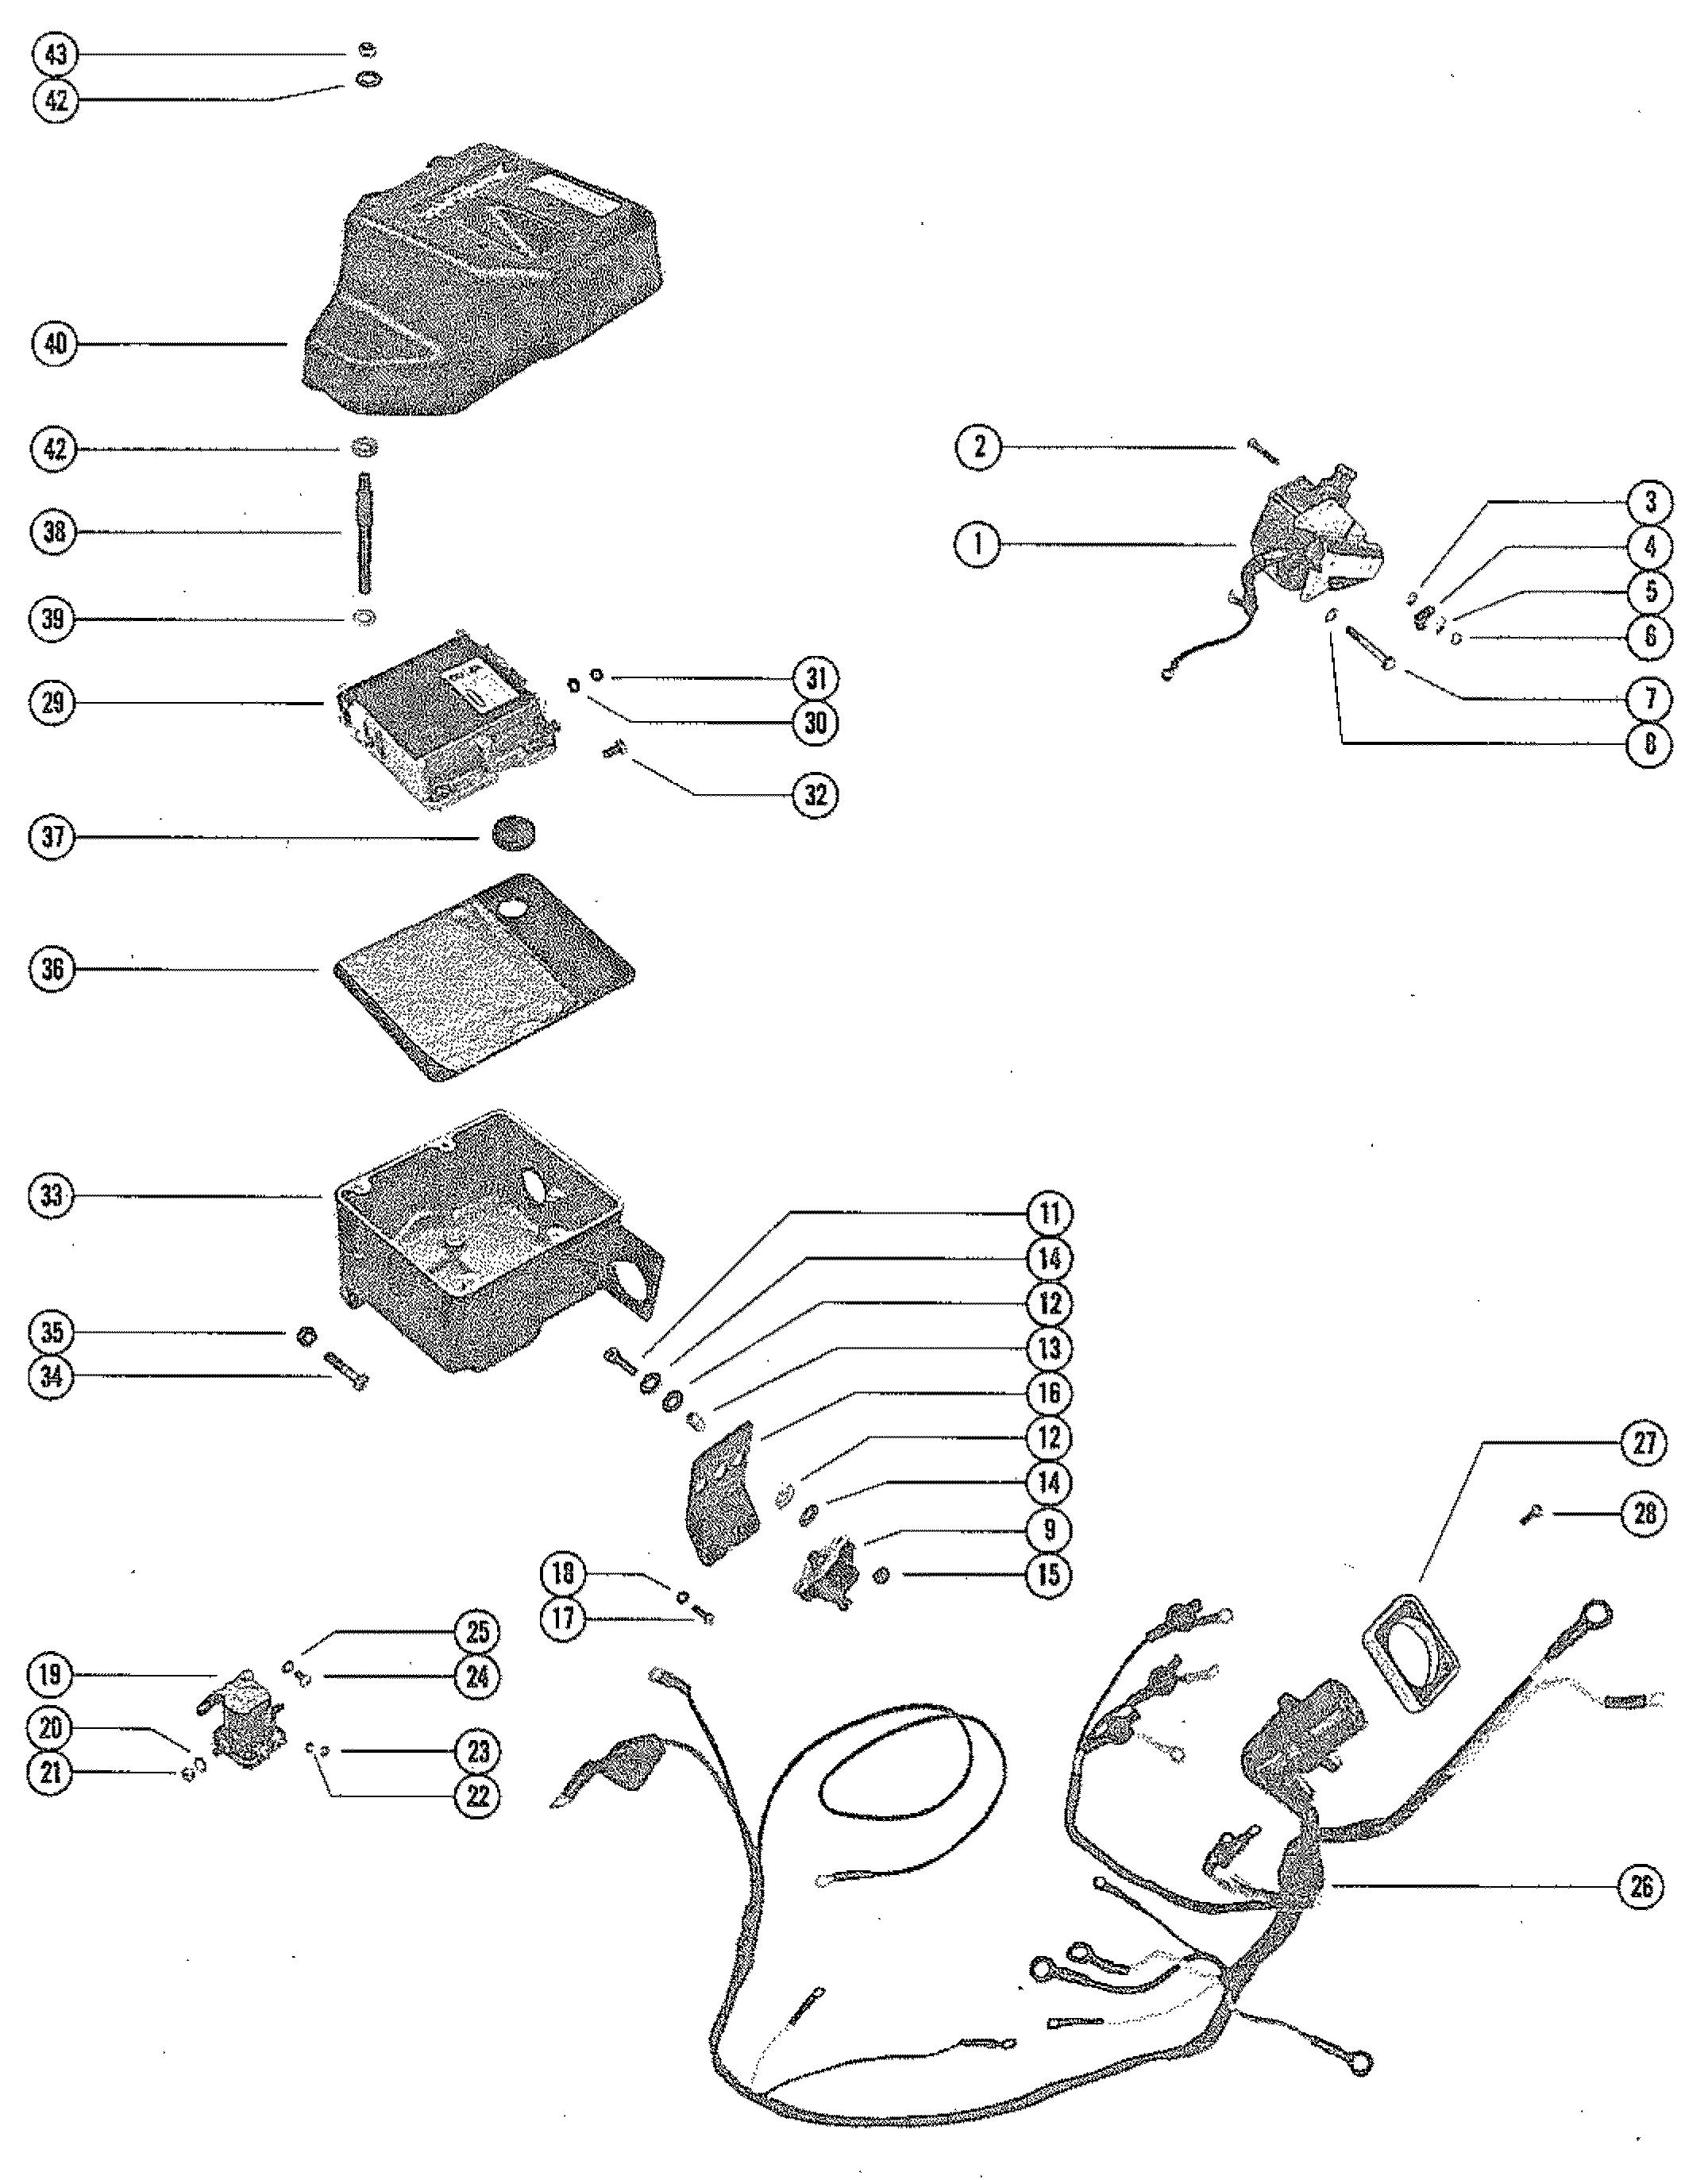 mercruiser 228 ignition coil wiring diagram. Black Bedroom Furniture Sets. Home Design Ideas